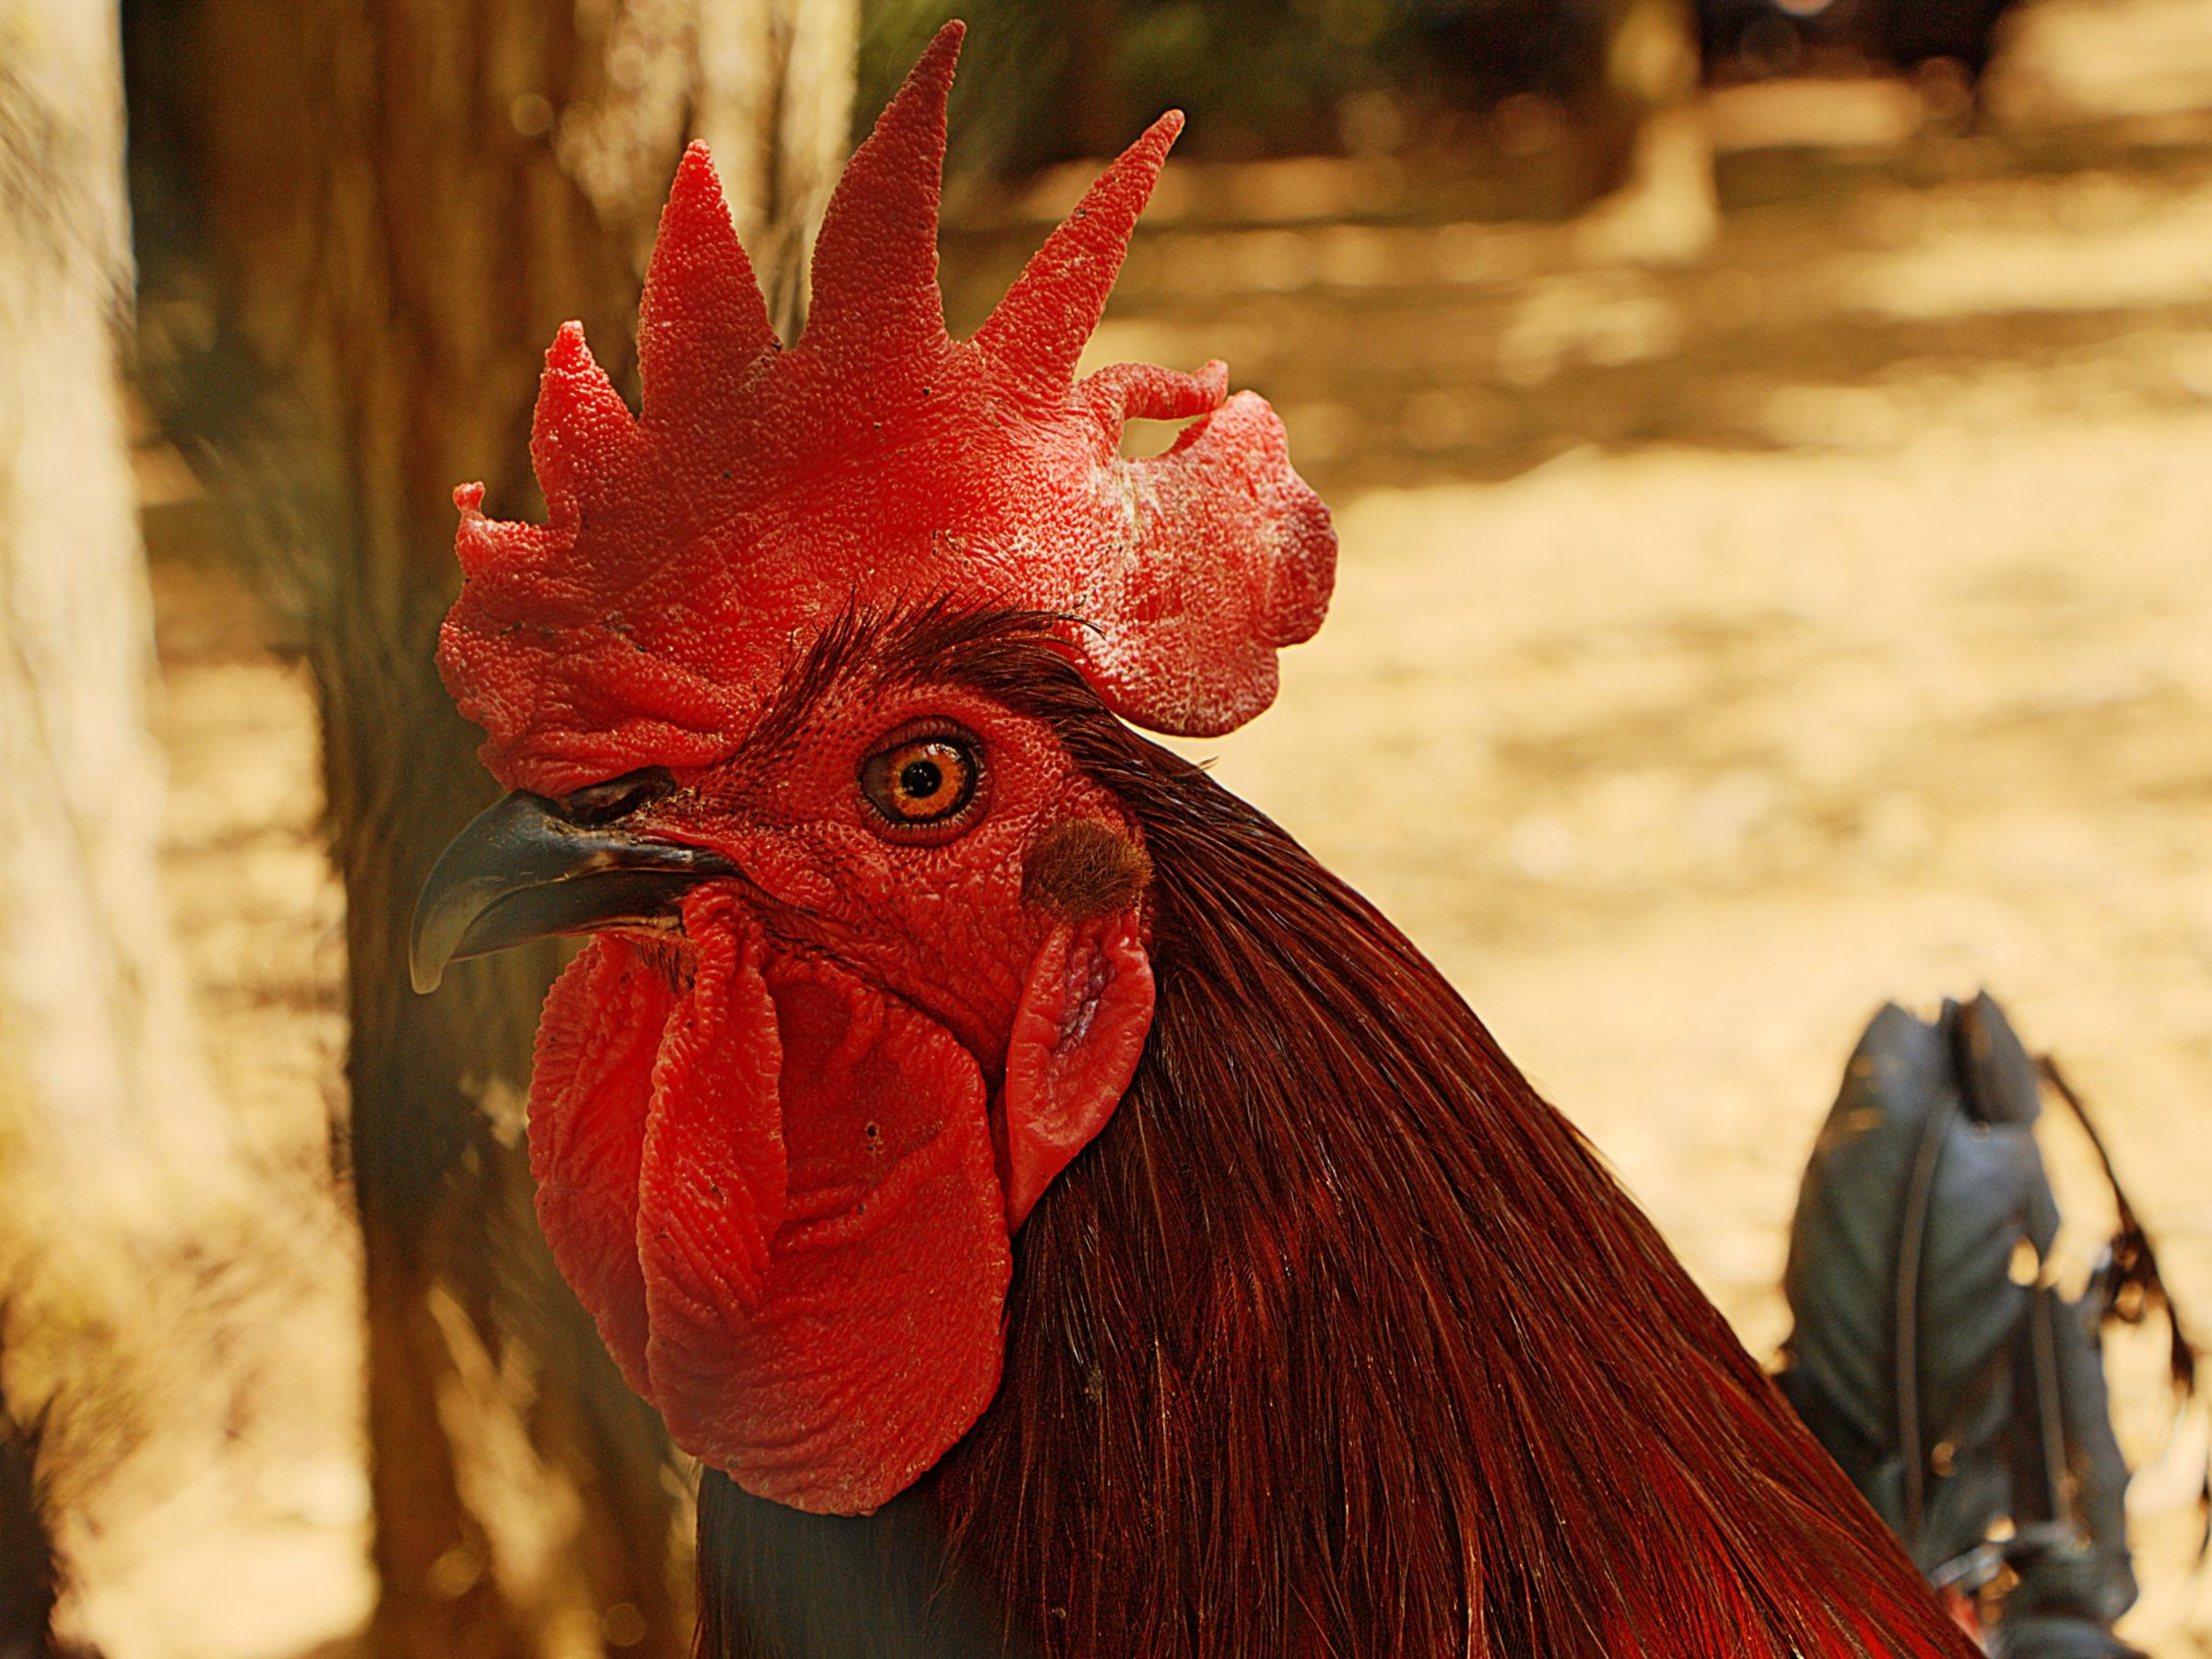 Fotos gratis : pájaro, granja, flor, animal, rojo, color, pollo ...